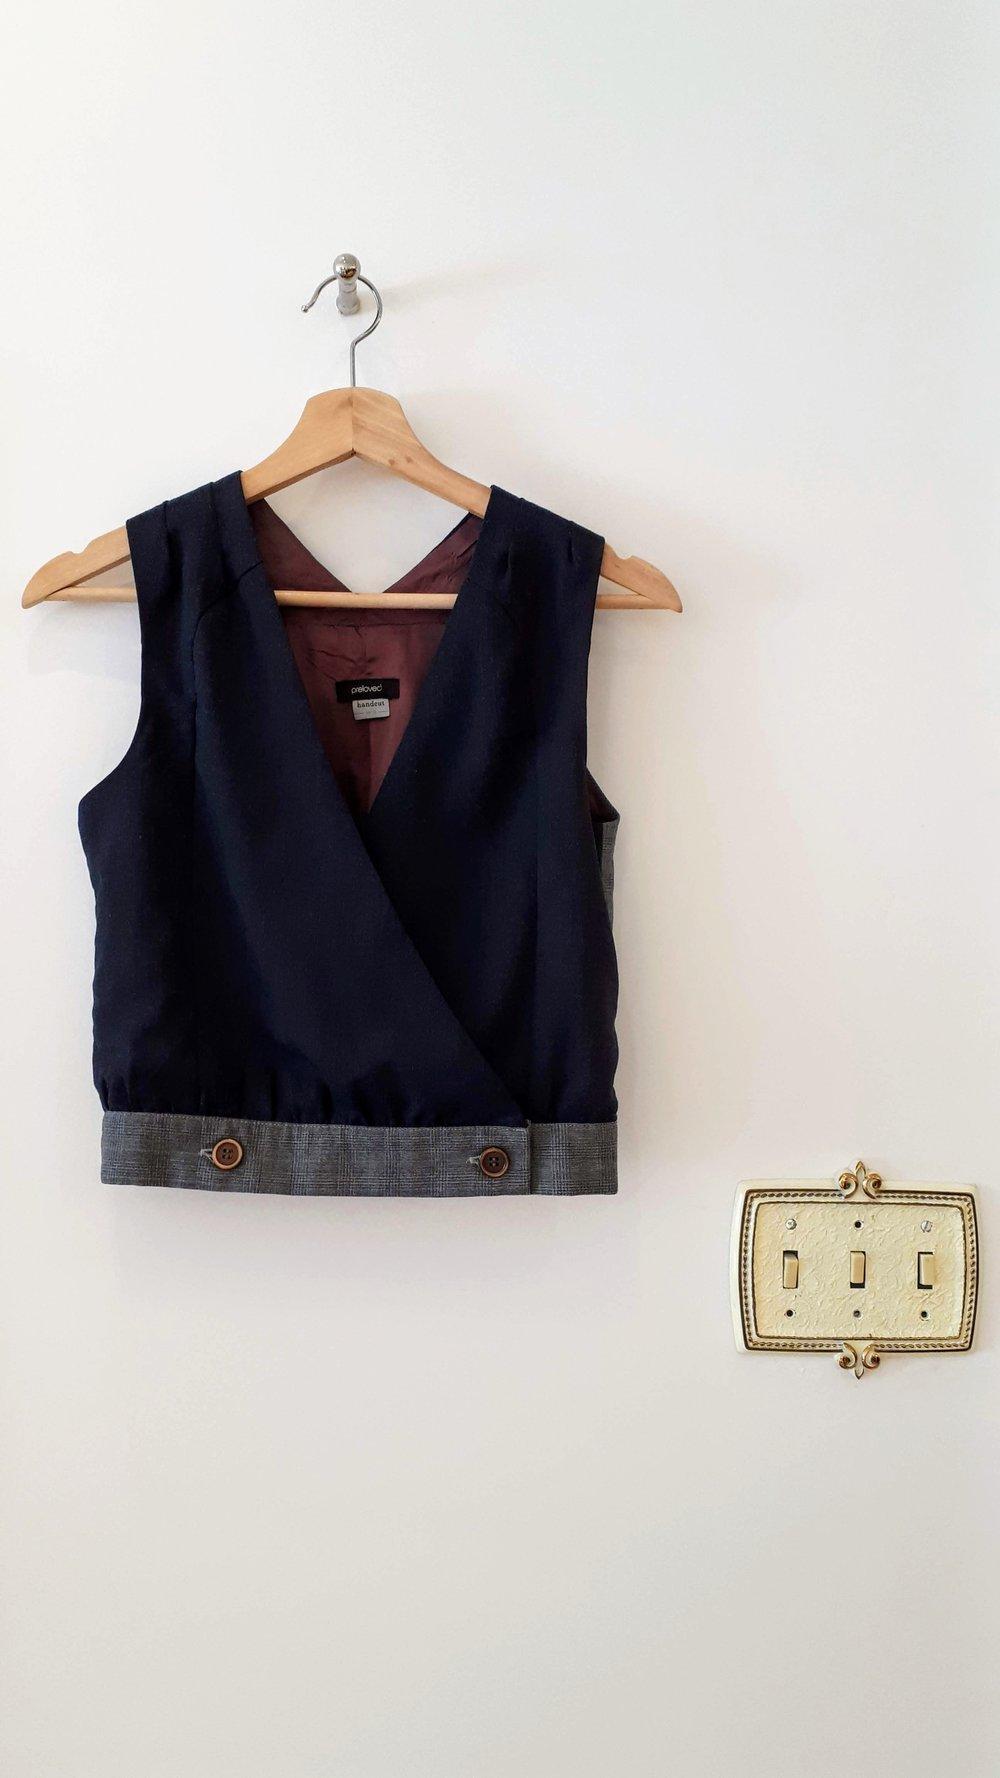 Preloved vest; Size XS, $26